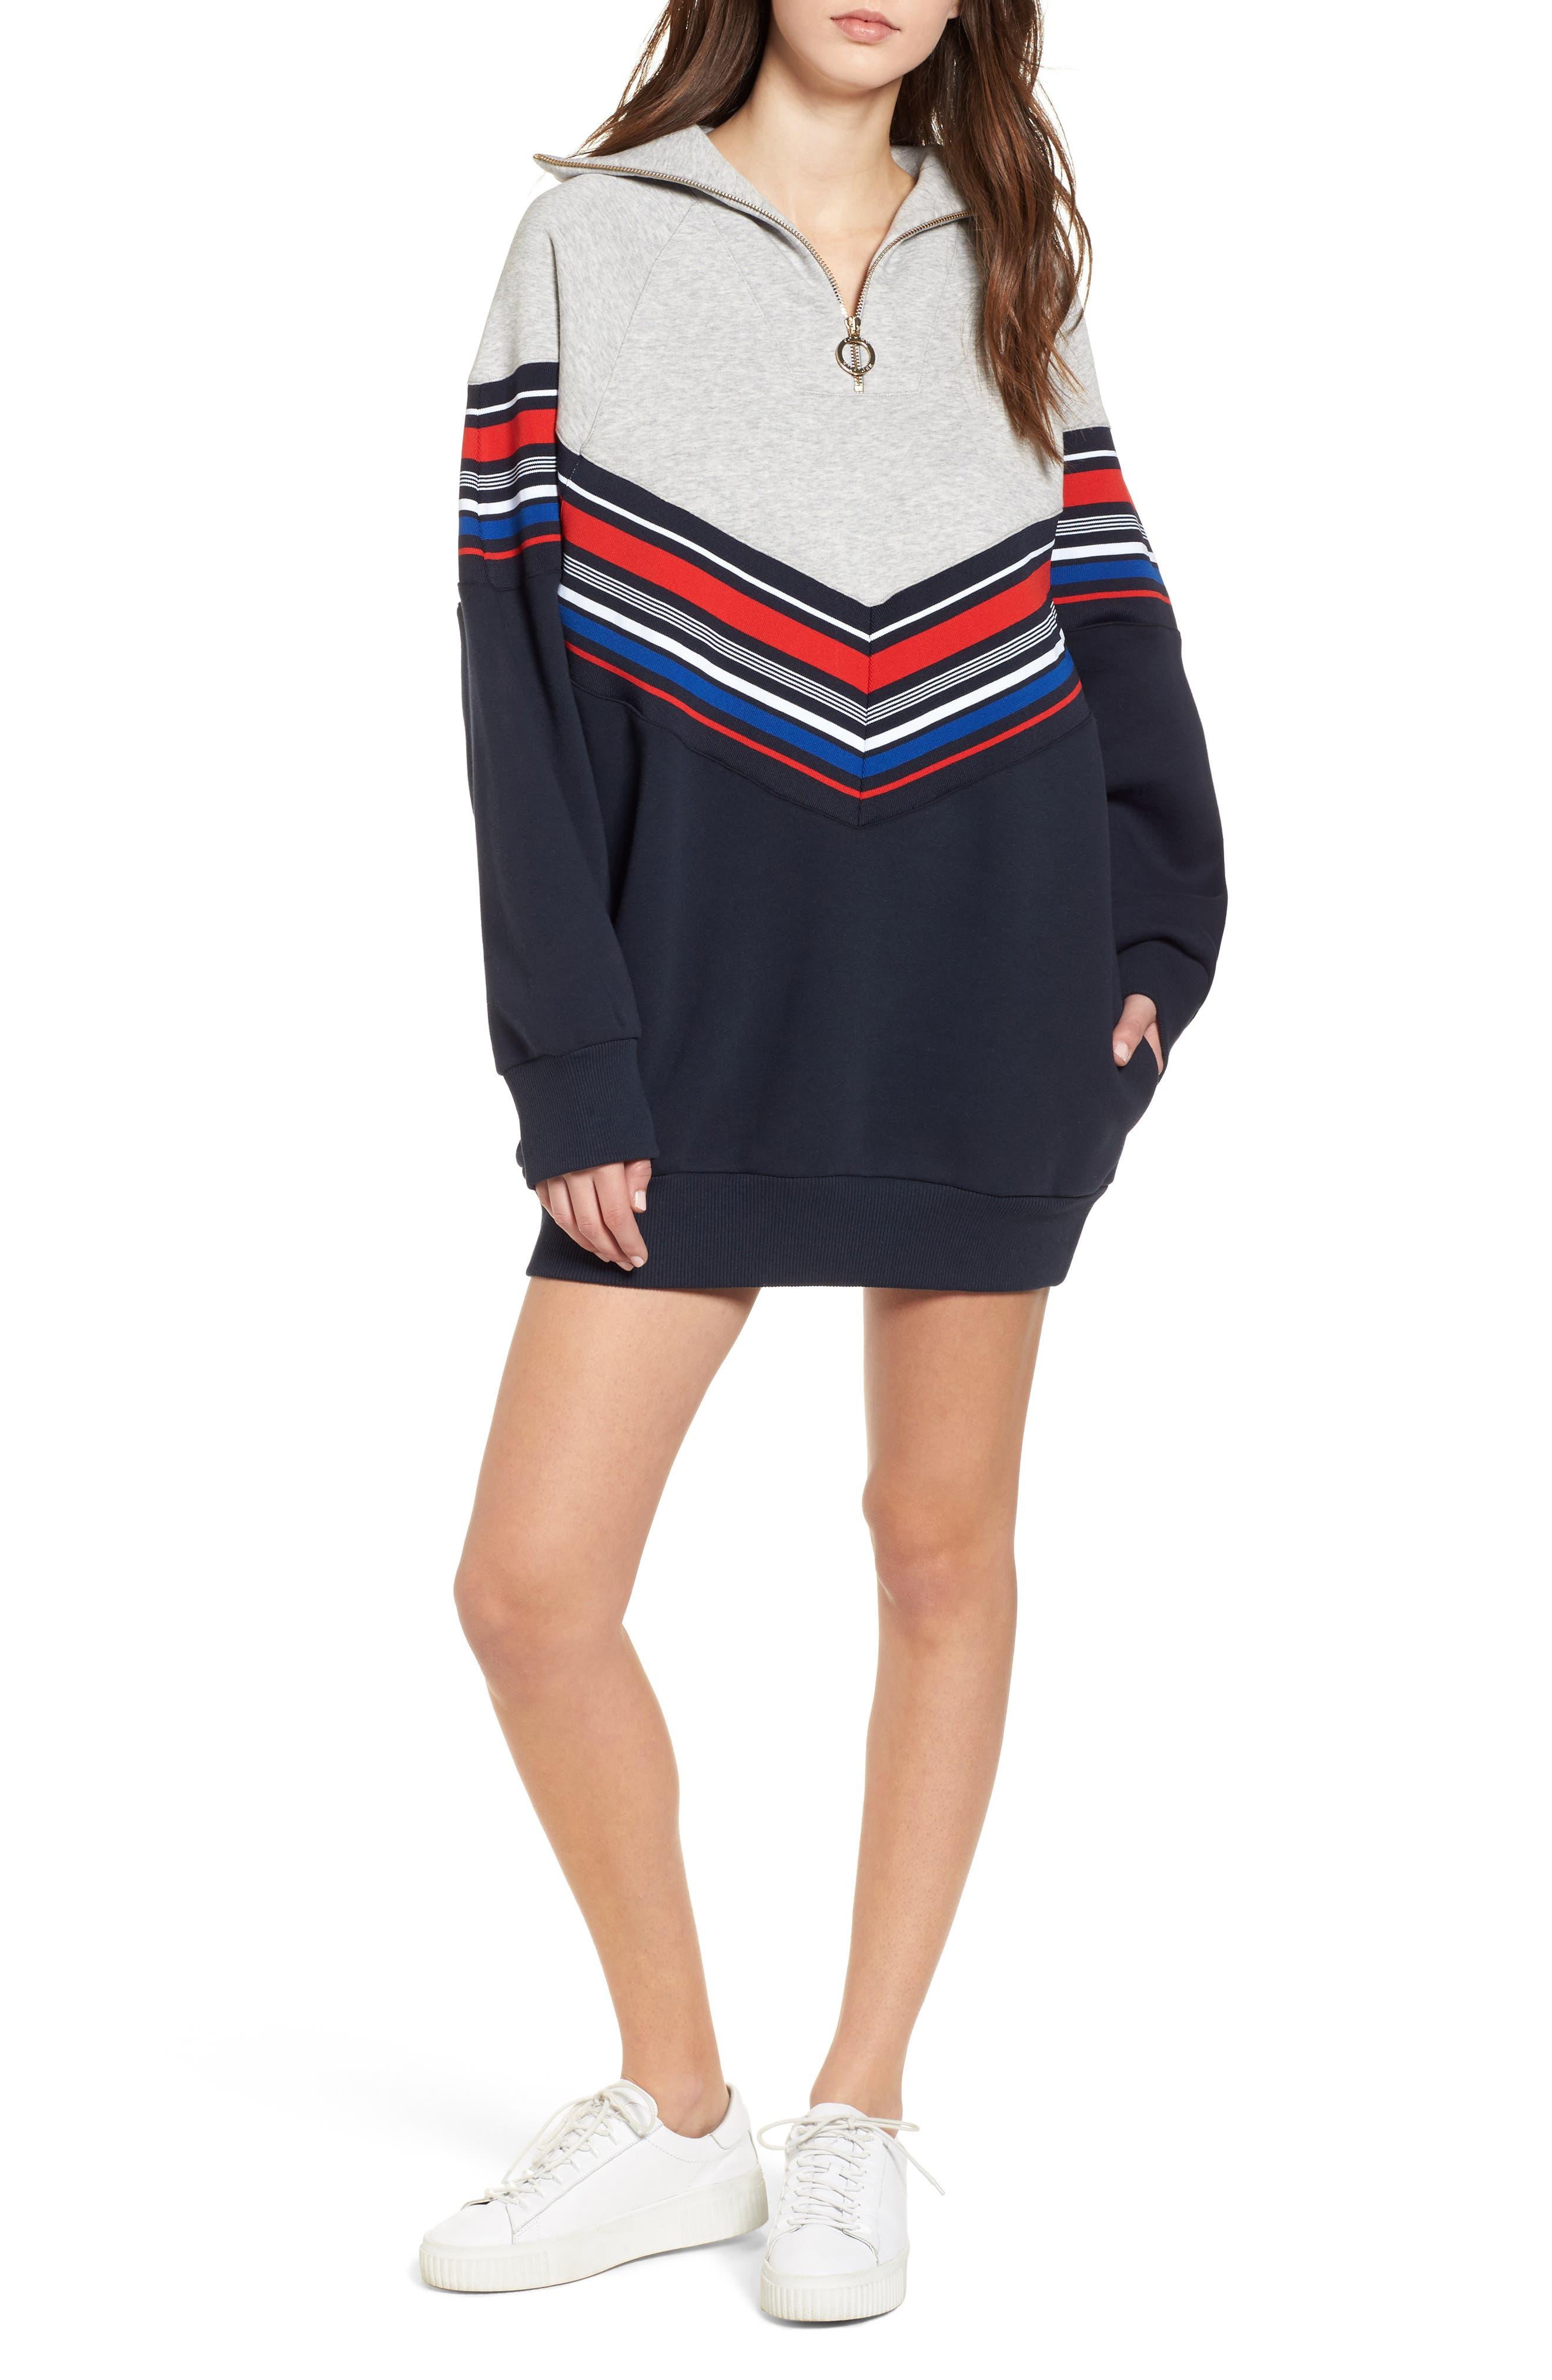 x Gigi Hadid Racing Sweatshirt Dress,                         Main,                         color, Midnight/ Hthr